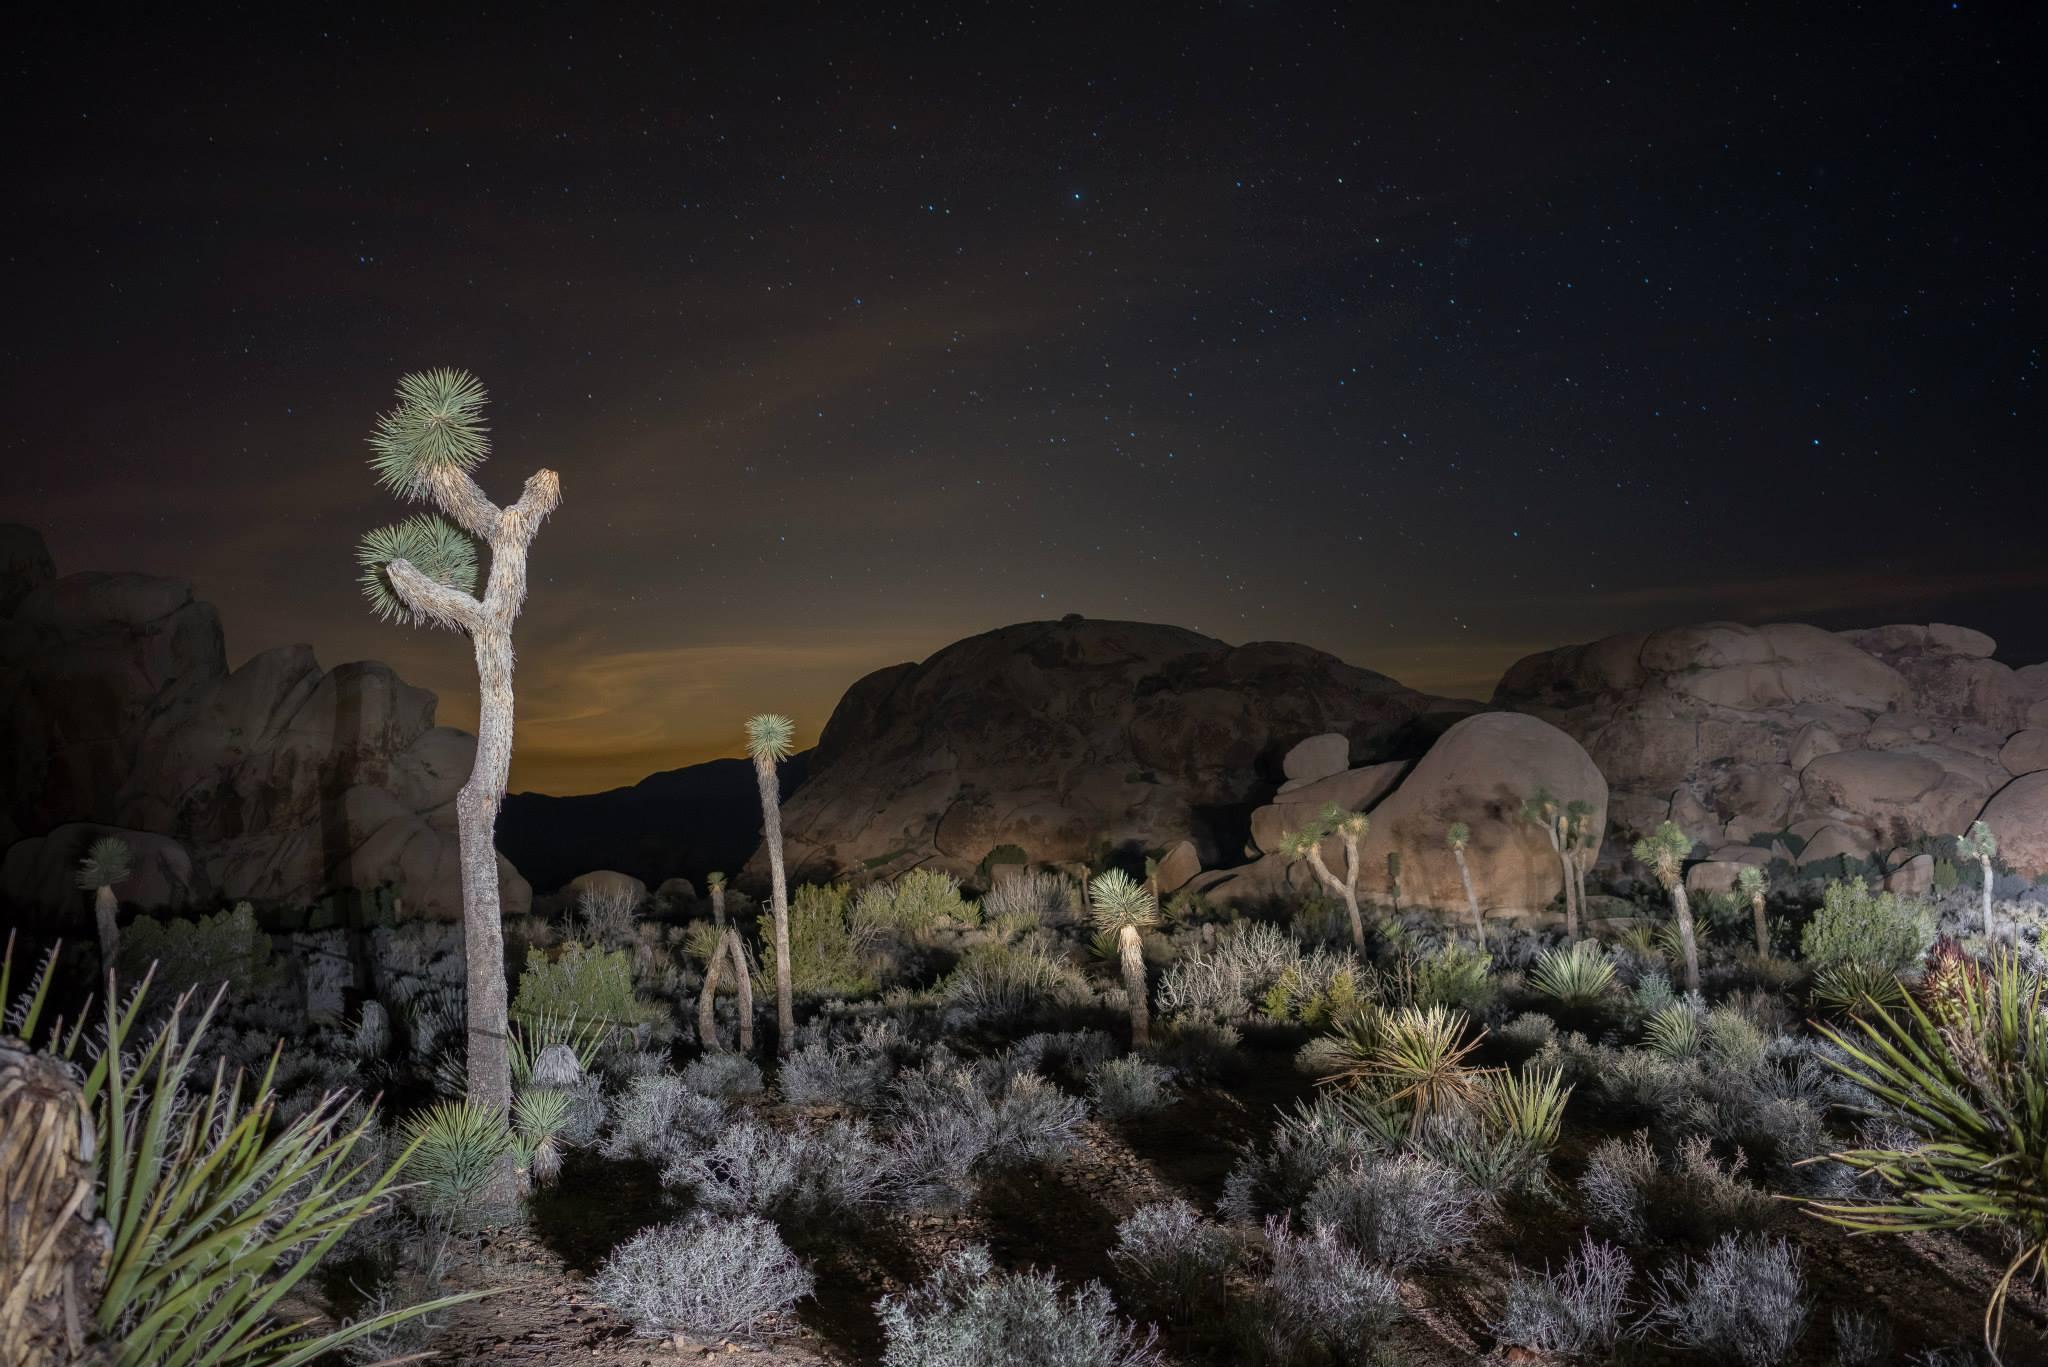 Joshua Tree Night Landscape